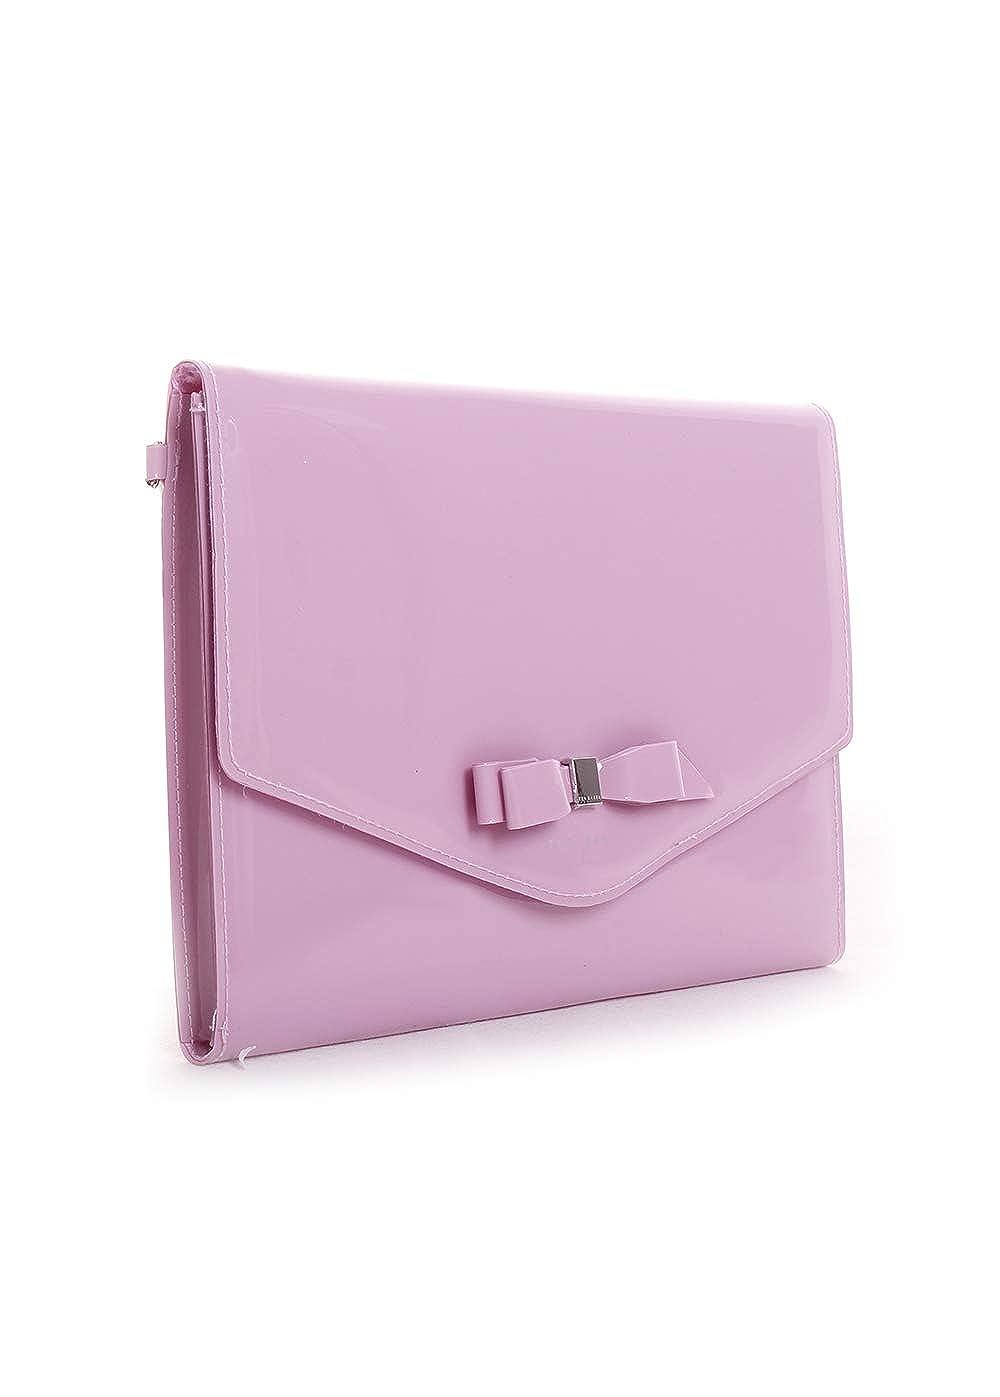 387c79591 Ted Baker Cersei Purple Clutch TB150976PU  Amazon.co.uk  Clothing